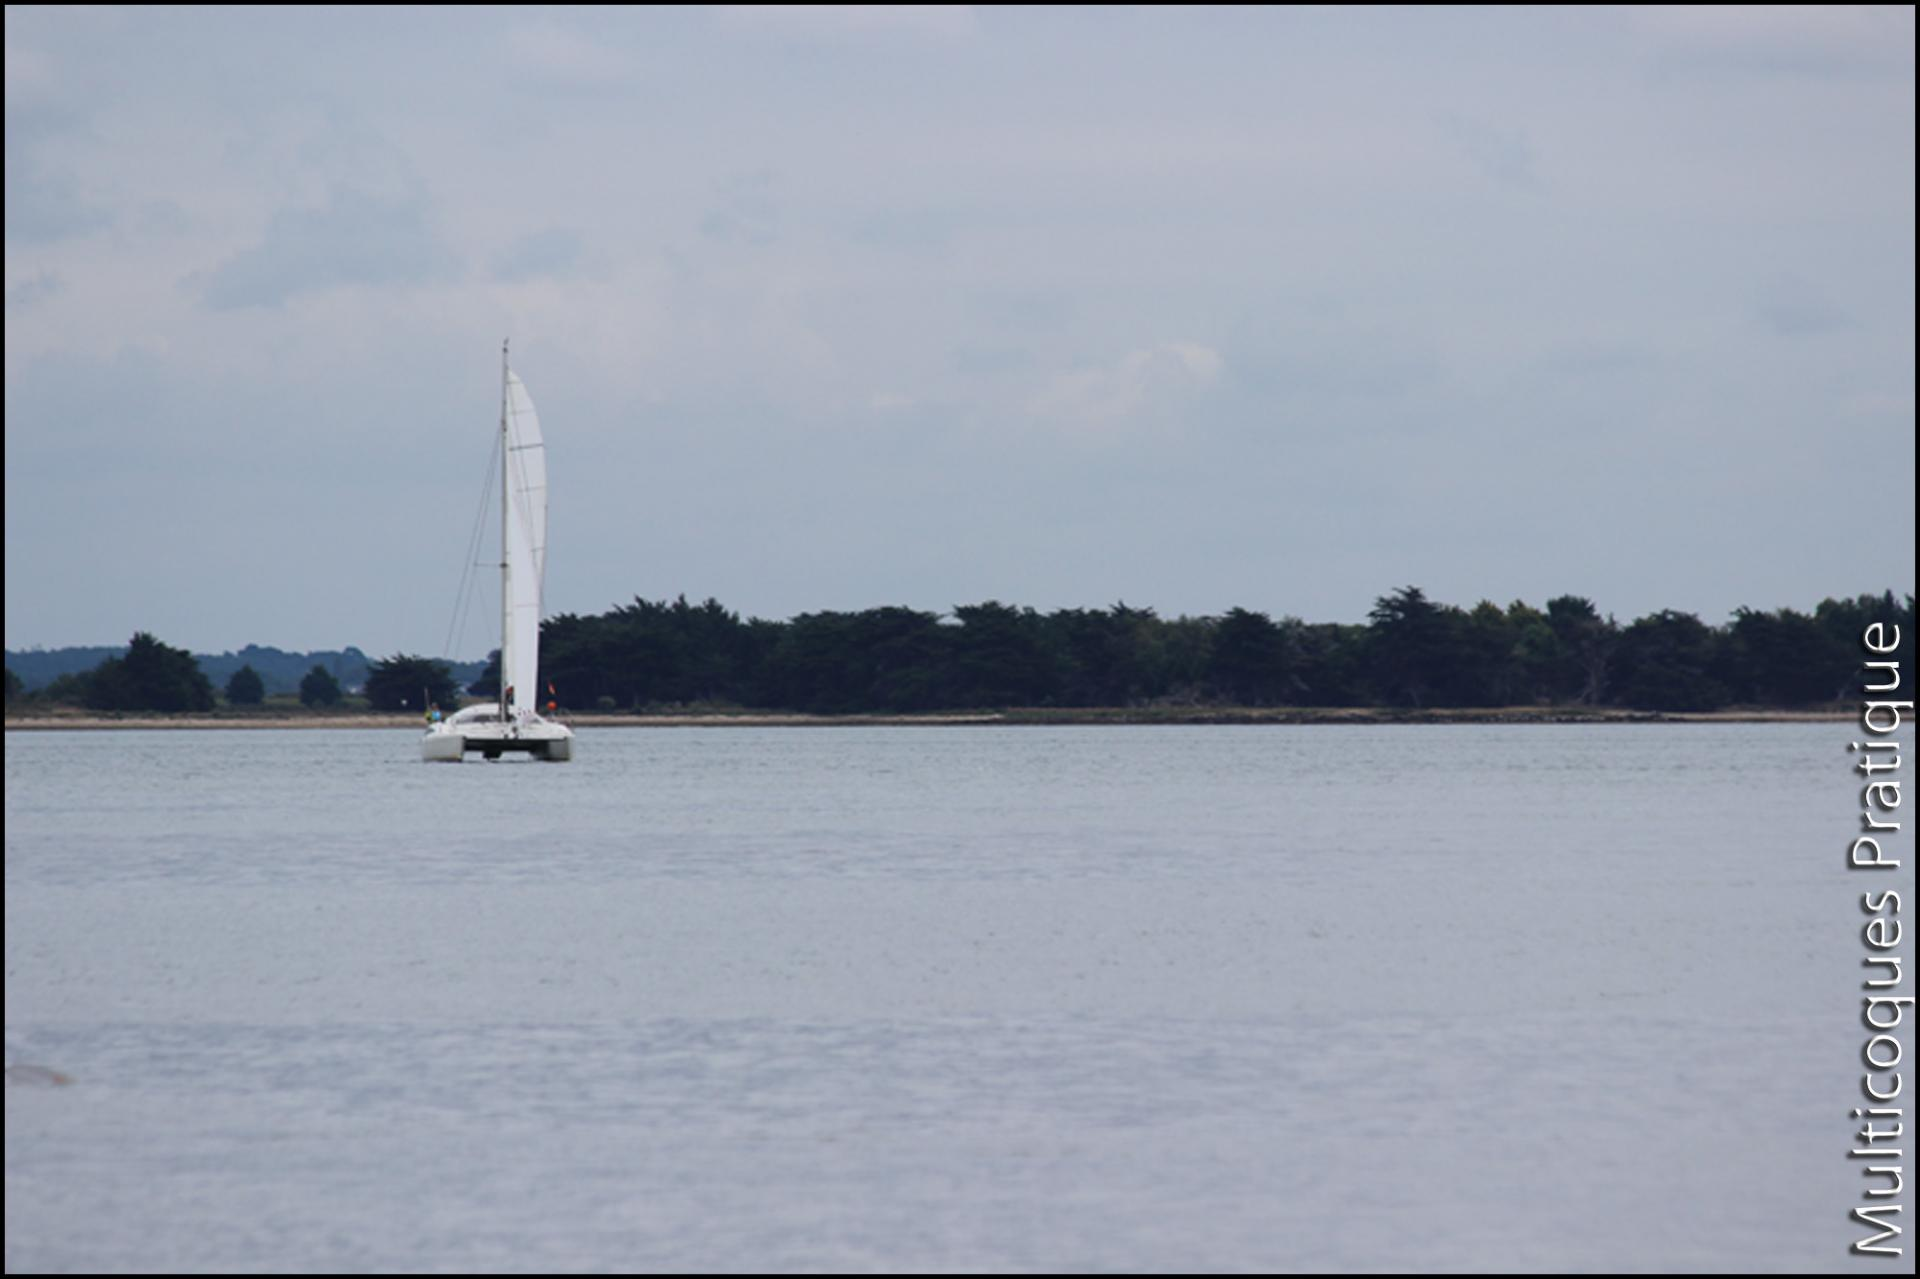 Maldives 32 : catamaran de largeur classique